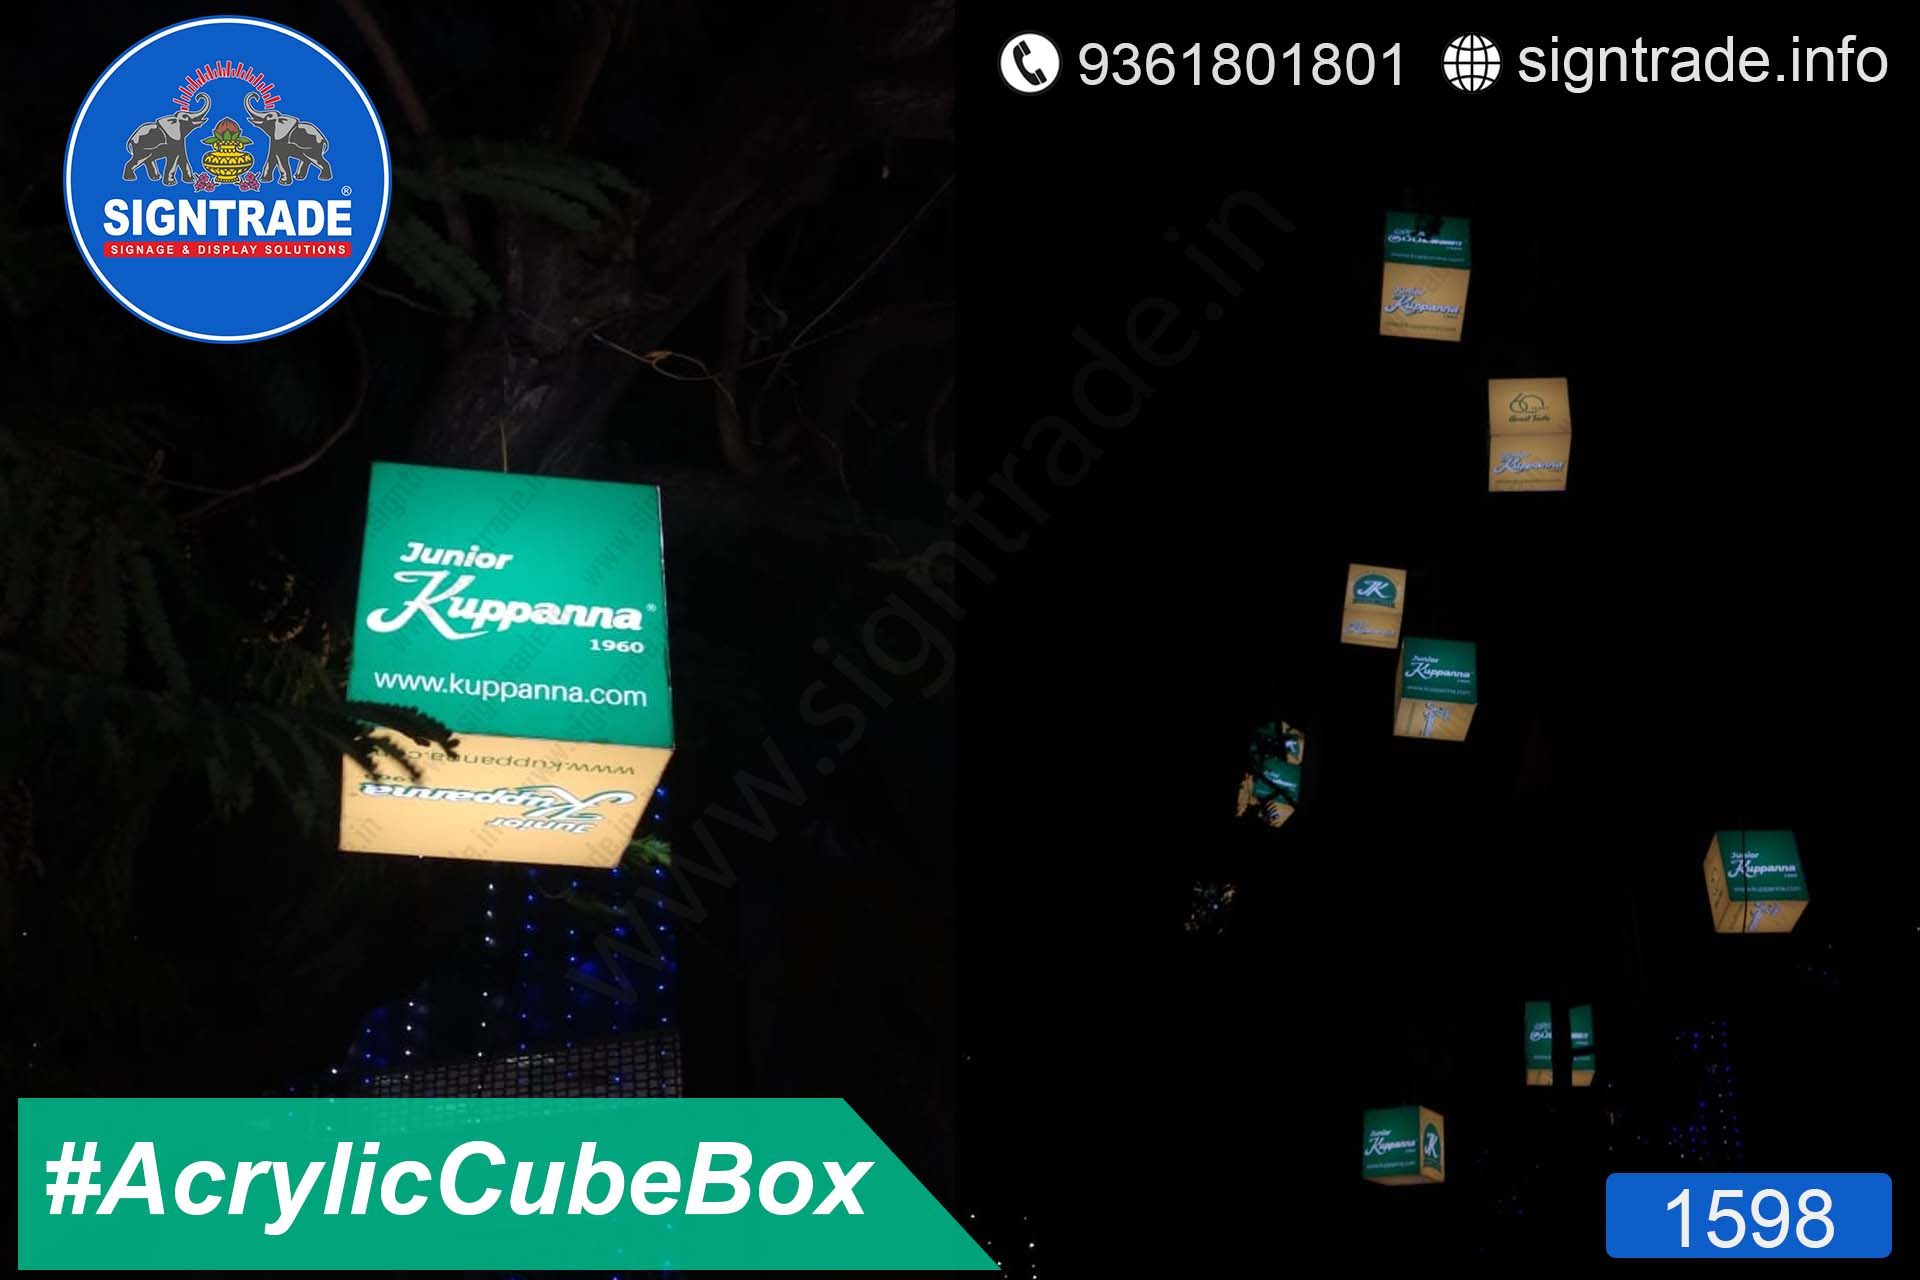 Hotel Junior Kuppanna, Chennai - SIGNTRADE - Acrylic Cube Box, LED Sign Board Manufacturers in Chennai